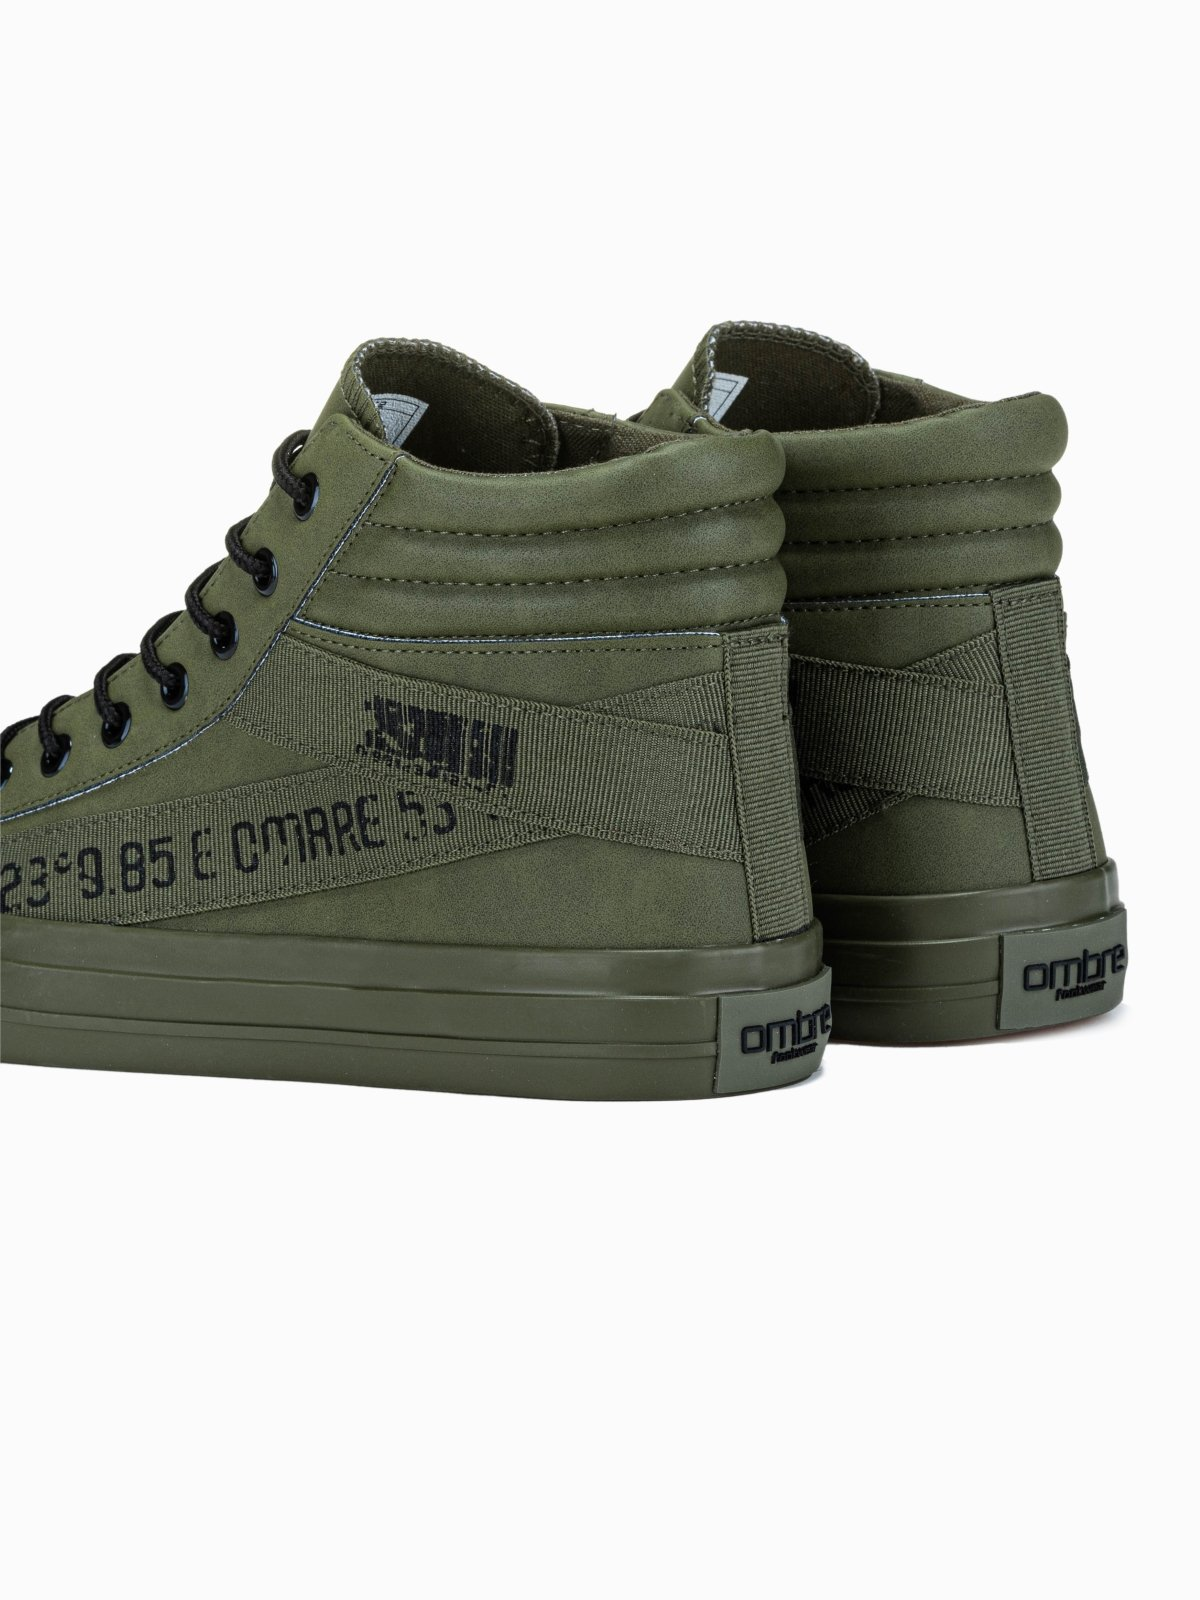 Trampki Meskie Sneakersy T357 Khaki Sklep Ombre Pl